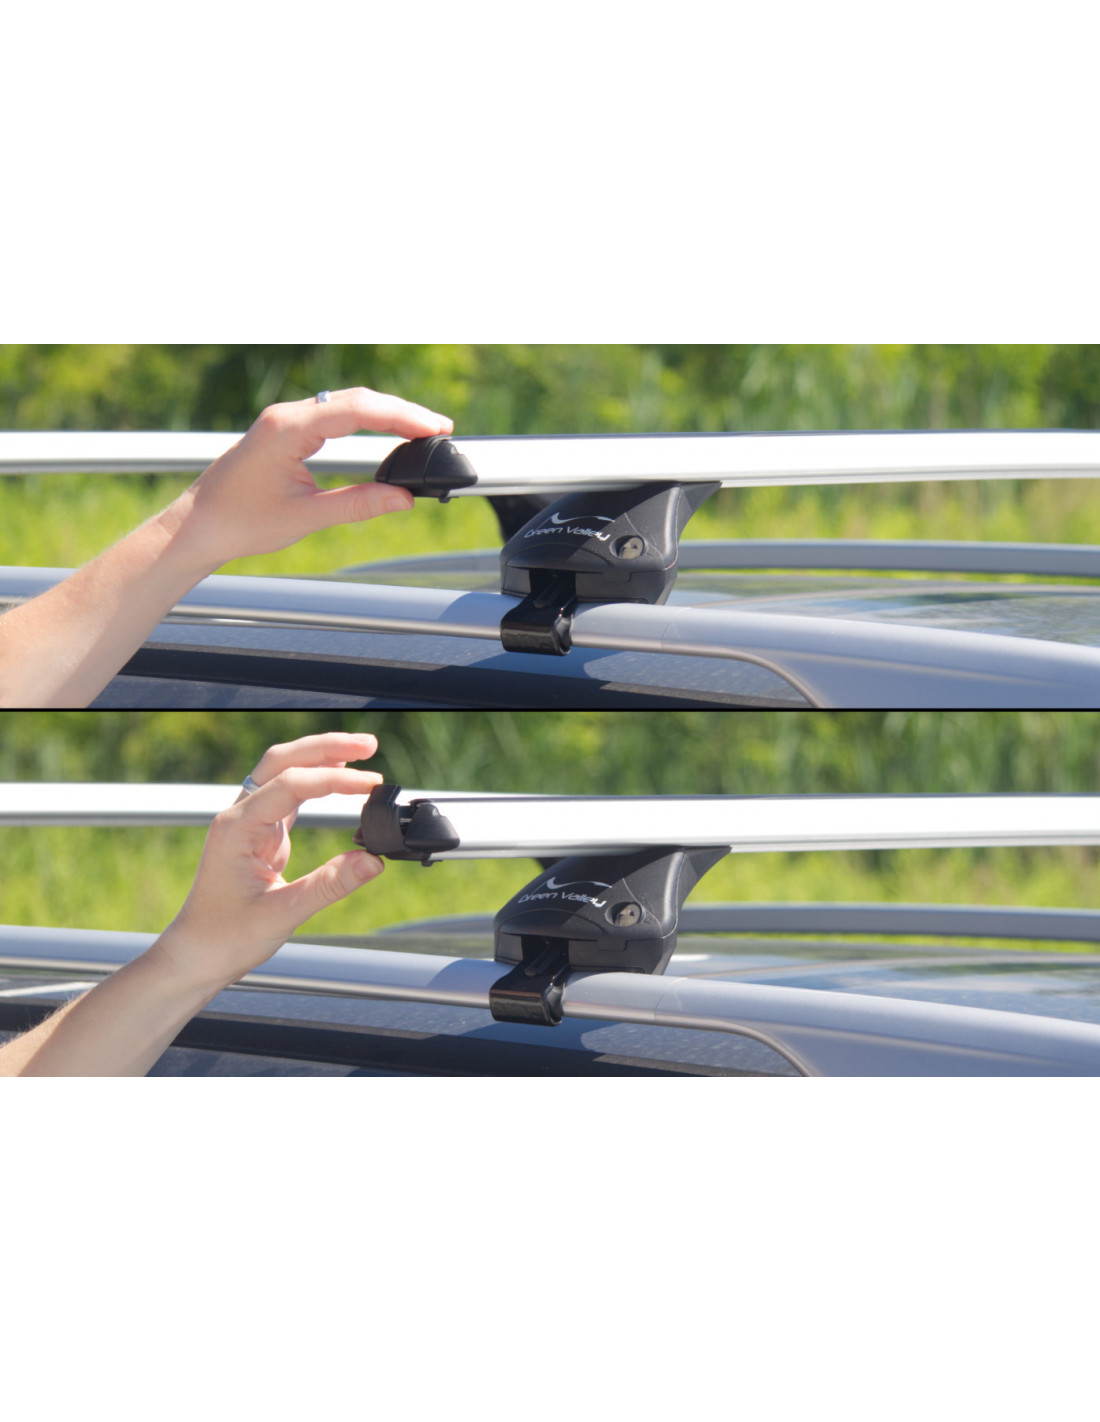 Hak holowniczy wypinany Toyota Land Cruiser V8 (J200) od